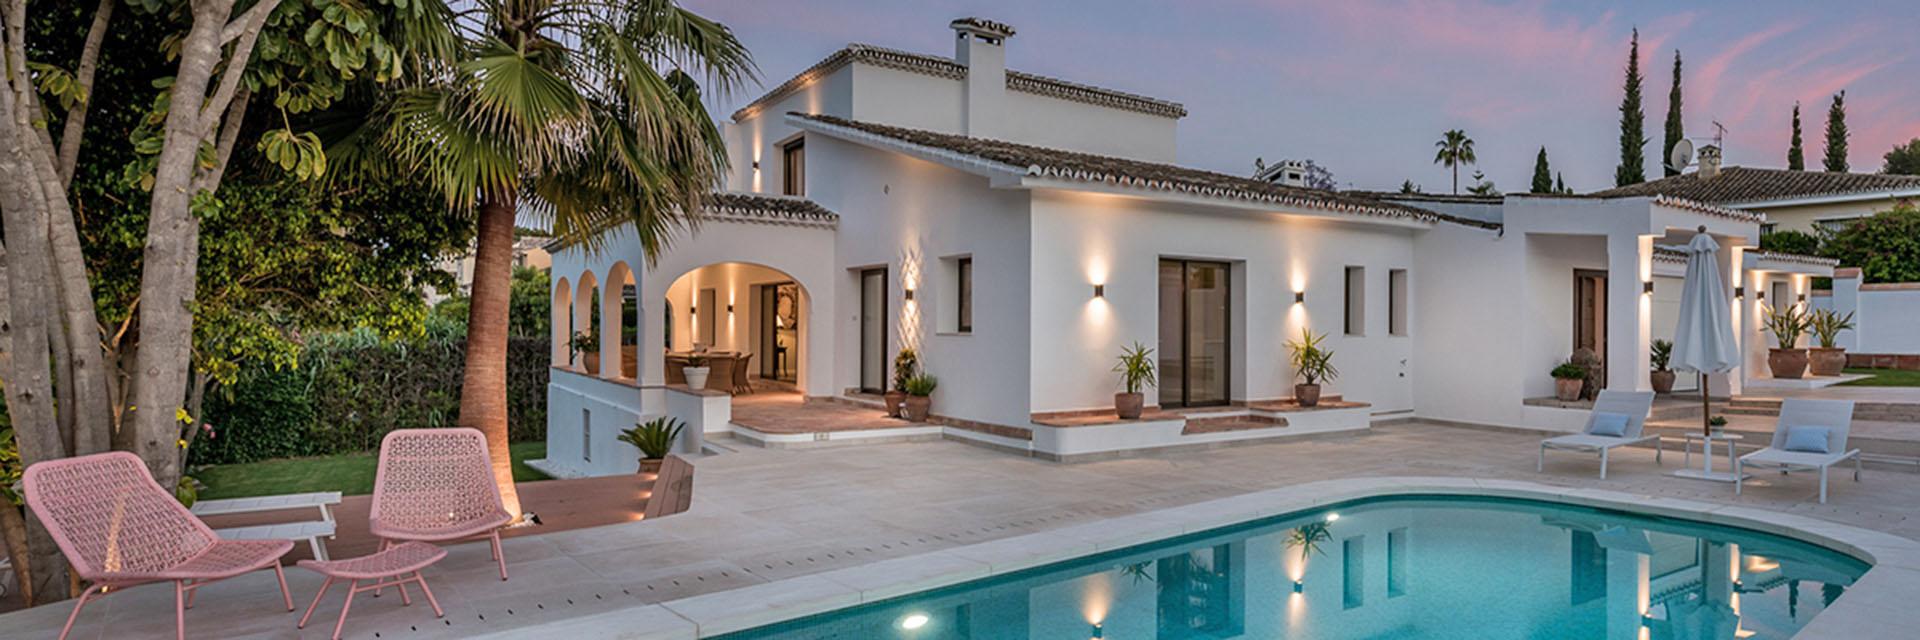 Renovated traditional Spanish villa by ProMas Building in Guadalmina, Marbella